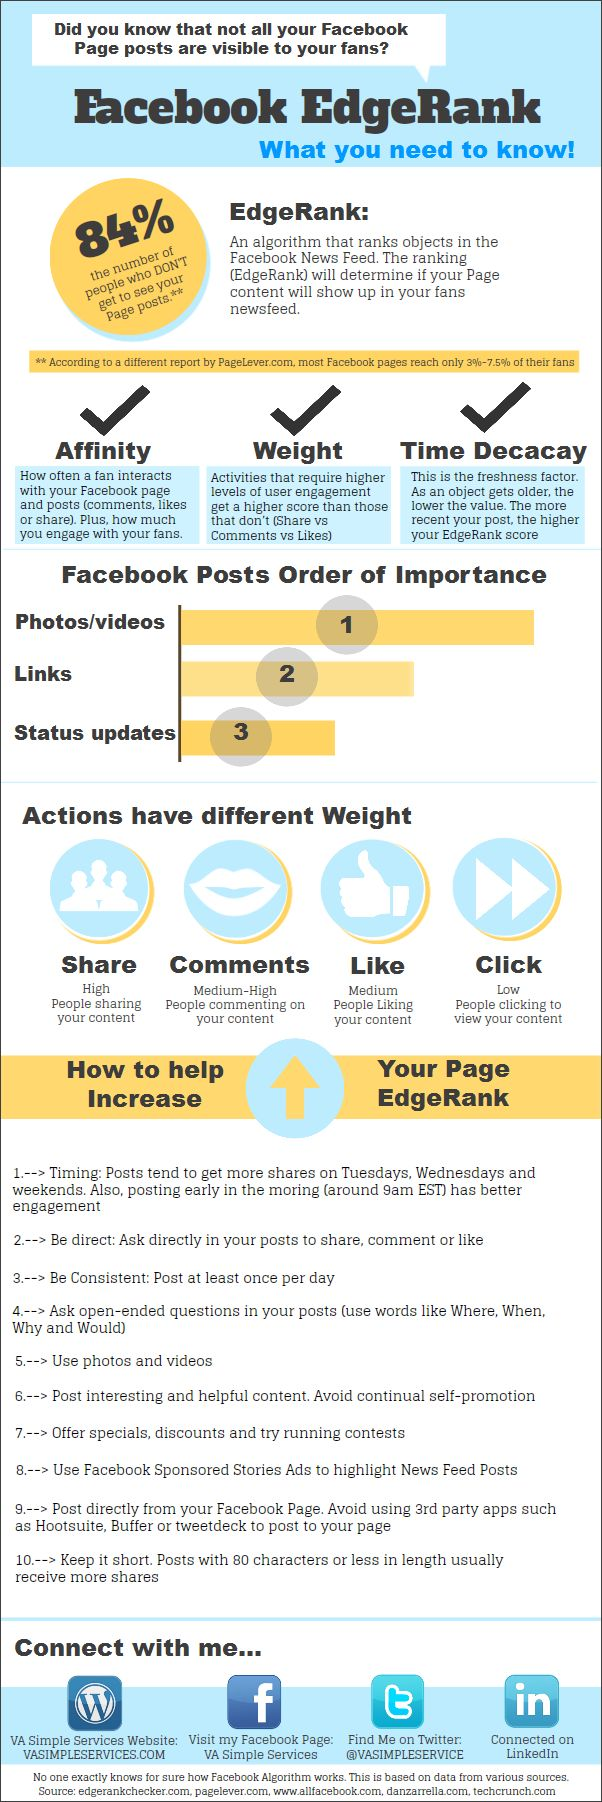 #facebook edgerank infographic